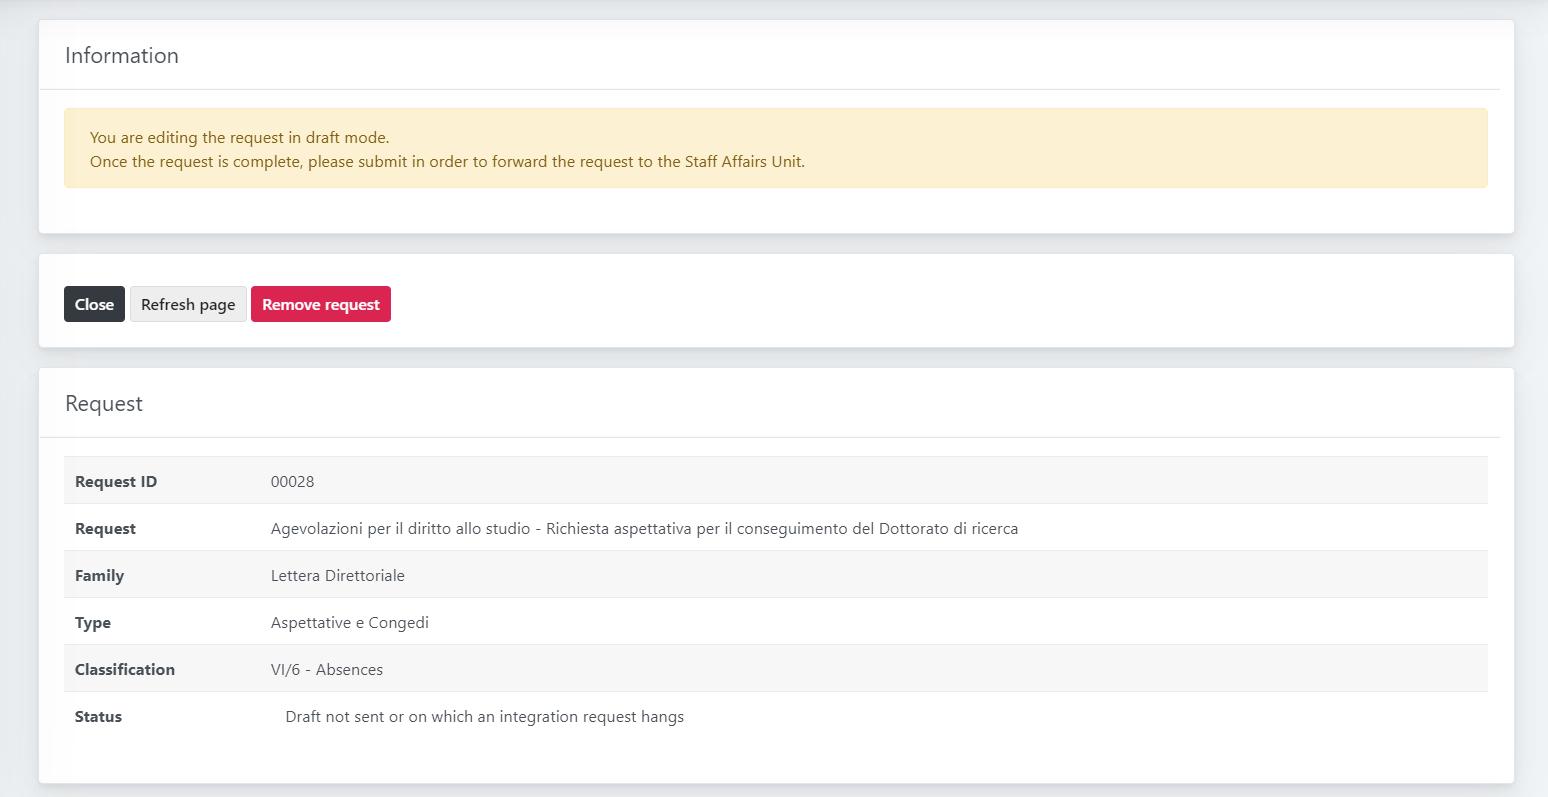 OpenStudio - HR Requests - Draft management